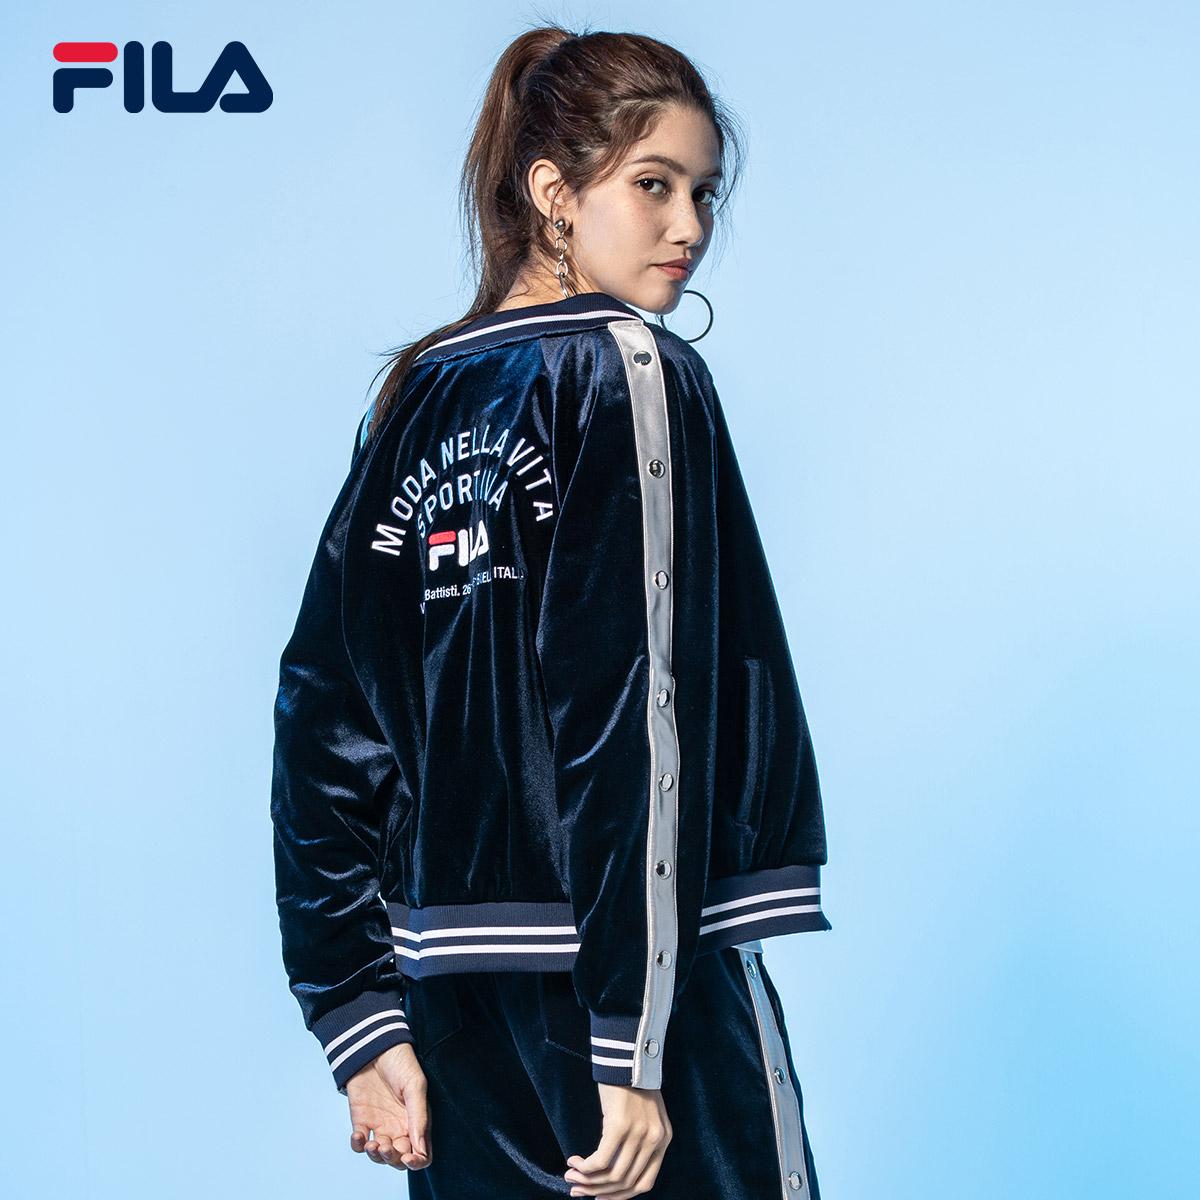 FILA斐乐外套女2018年秋季新款时尚运动休闲外套针织舒适上衣女